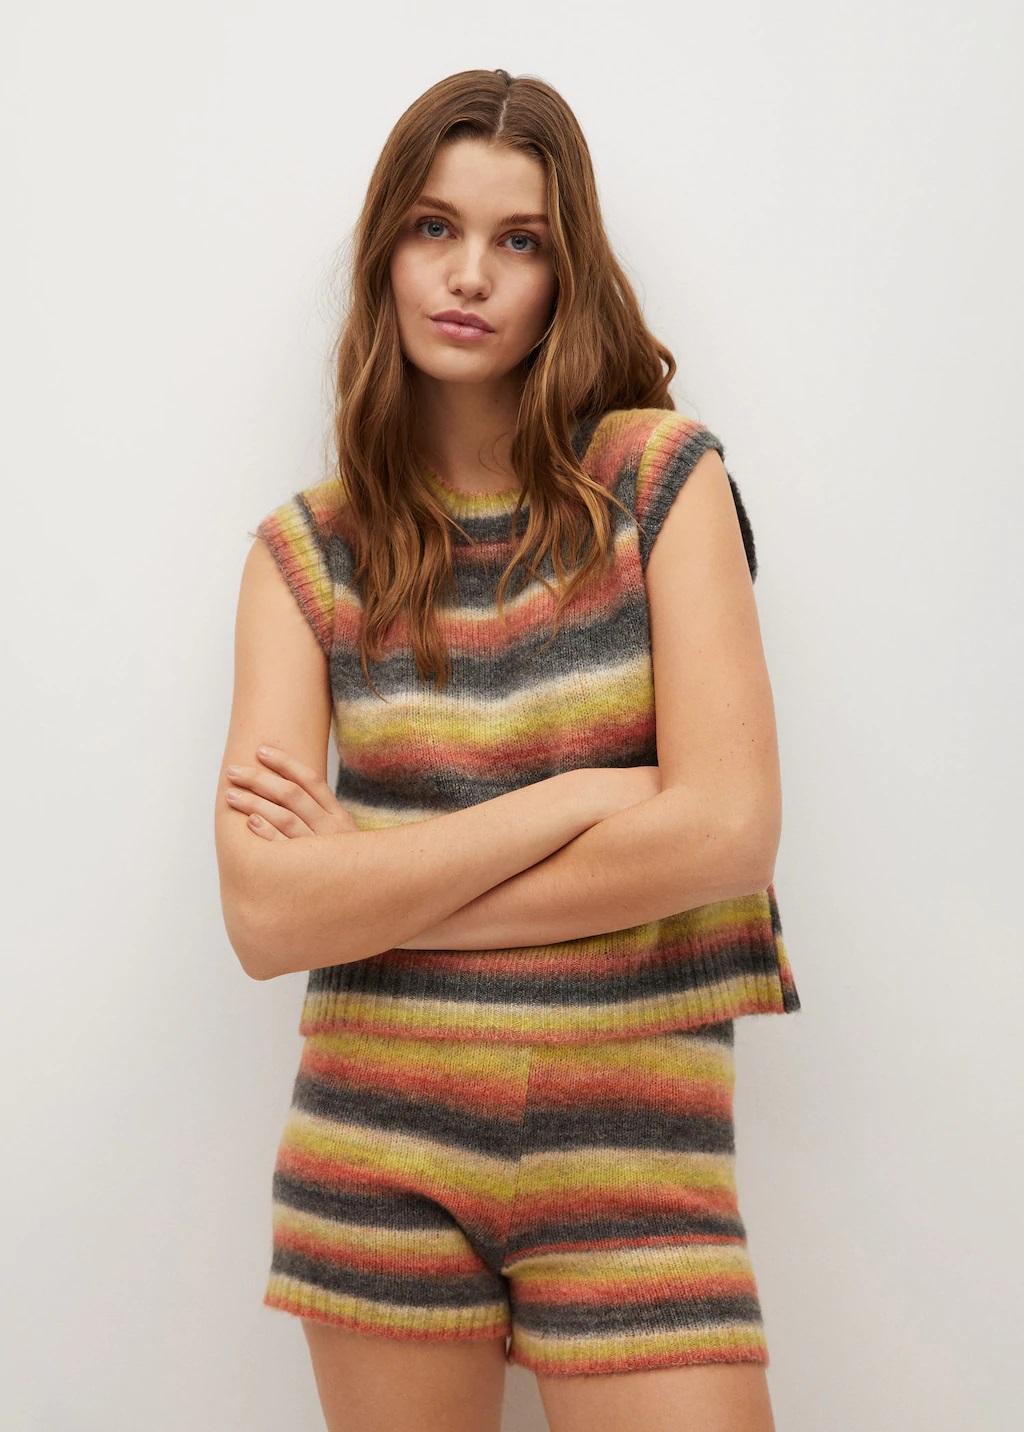 Amelia Bono se apunta a la moda del chaleco viral de Mango